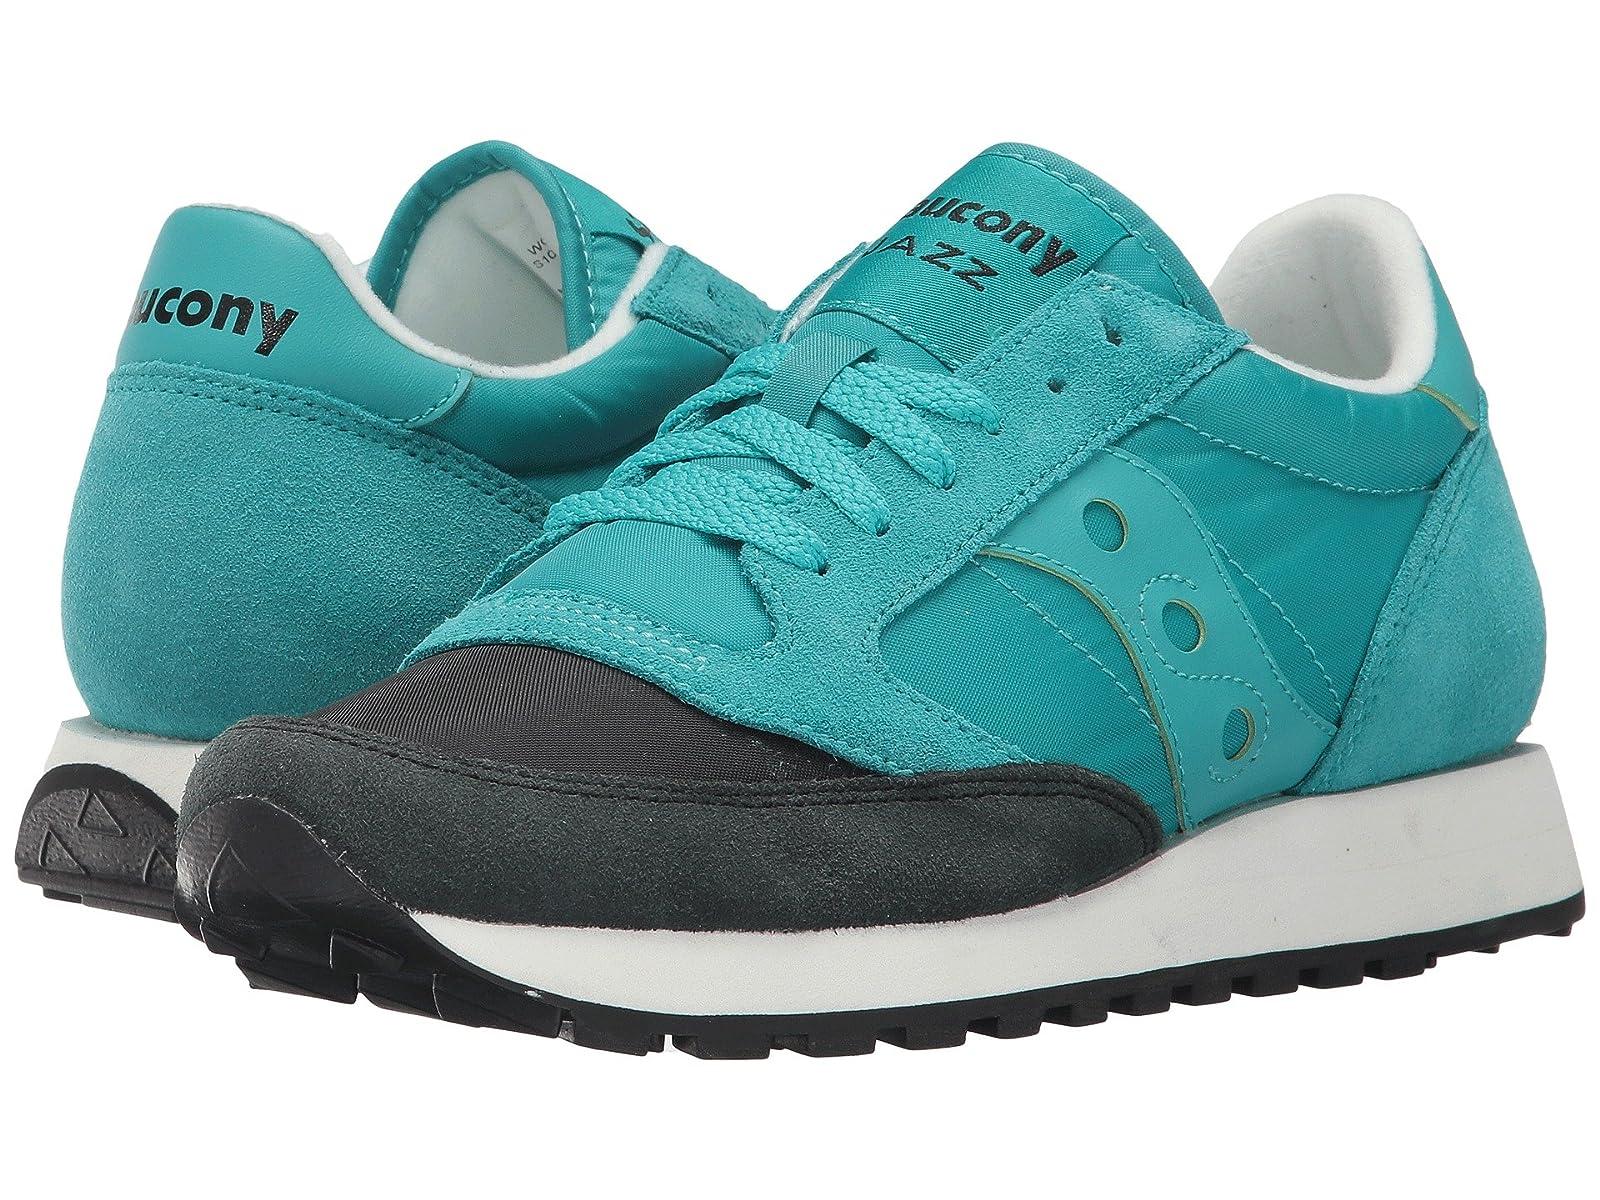 Saucony Originals Jazz OriginalCheap and distinctive eye-catching shoes